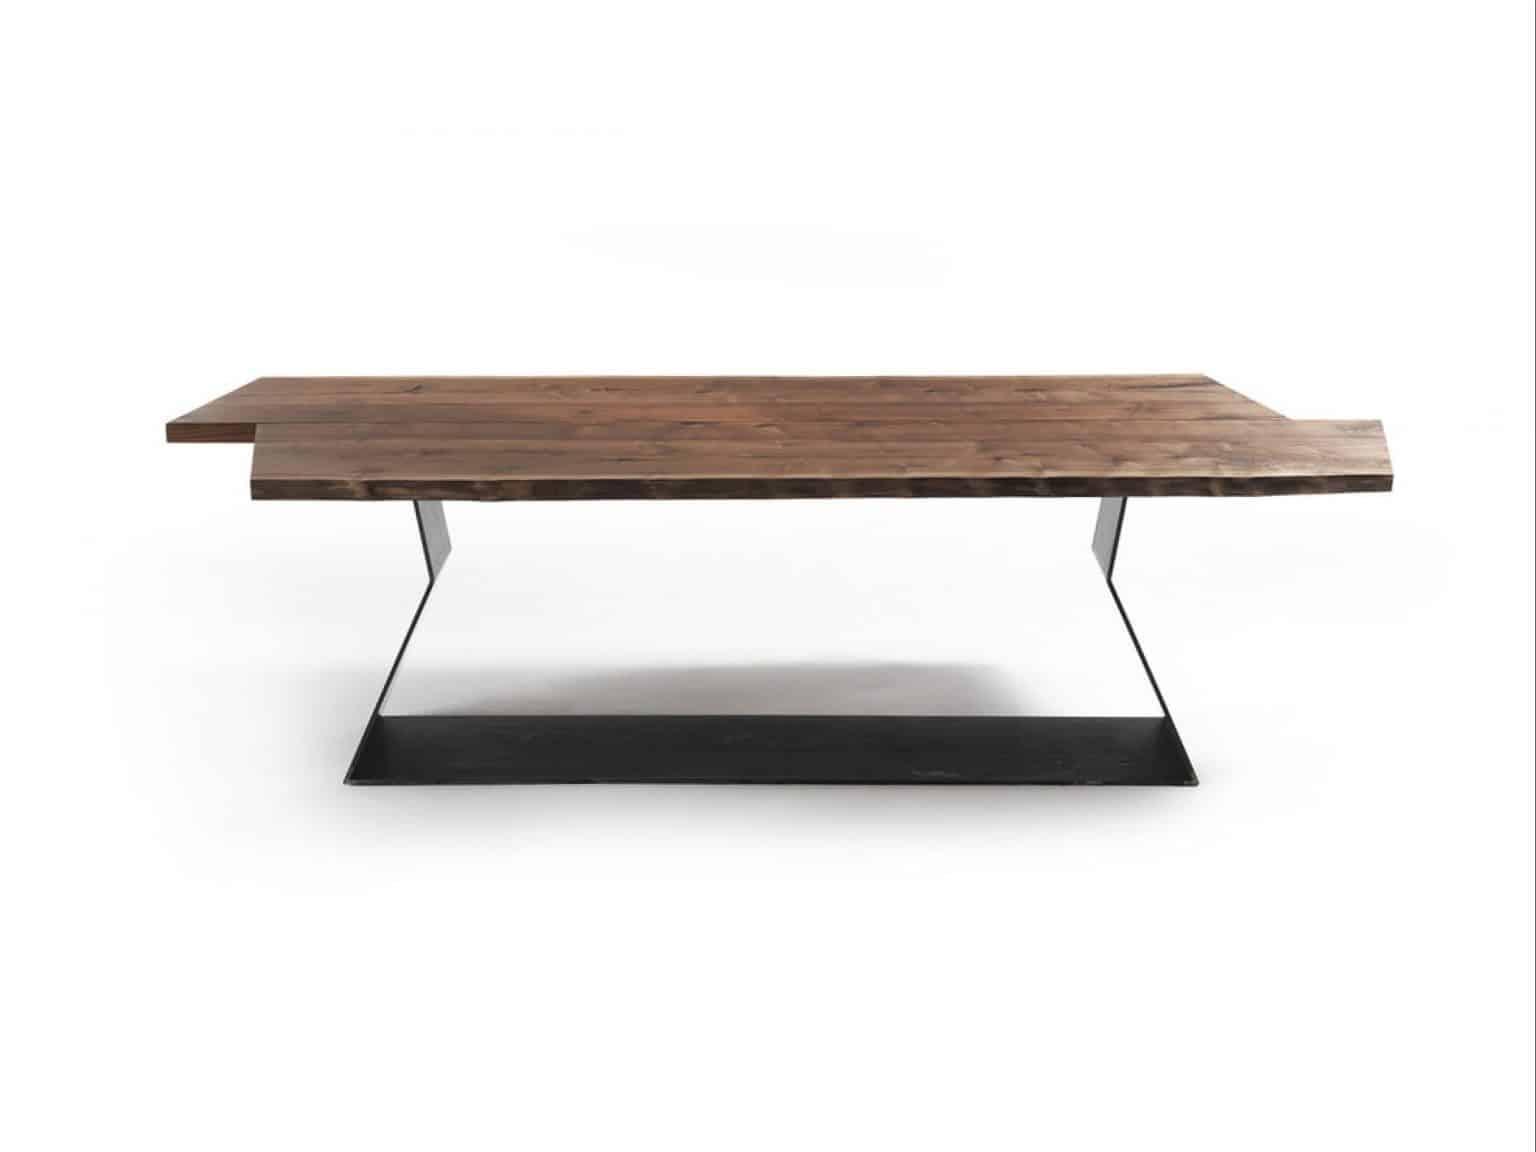 Riva1920 tafel Bedrock plank pa